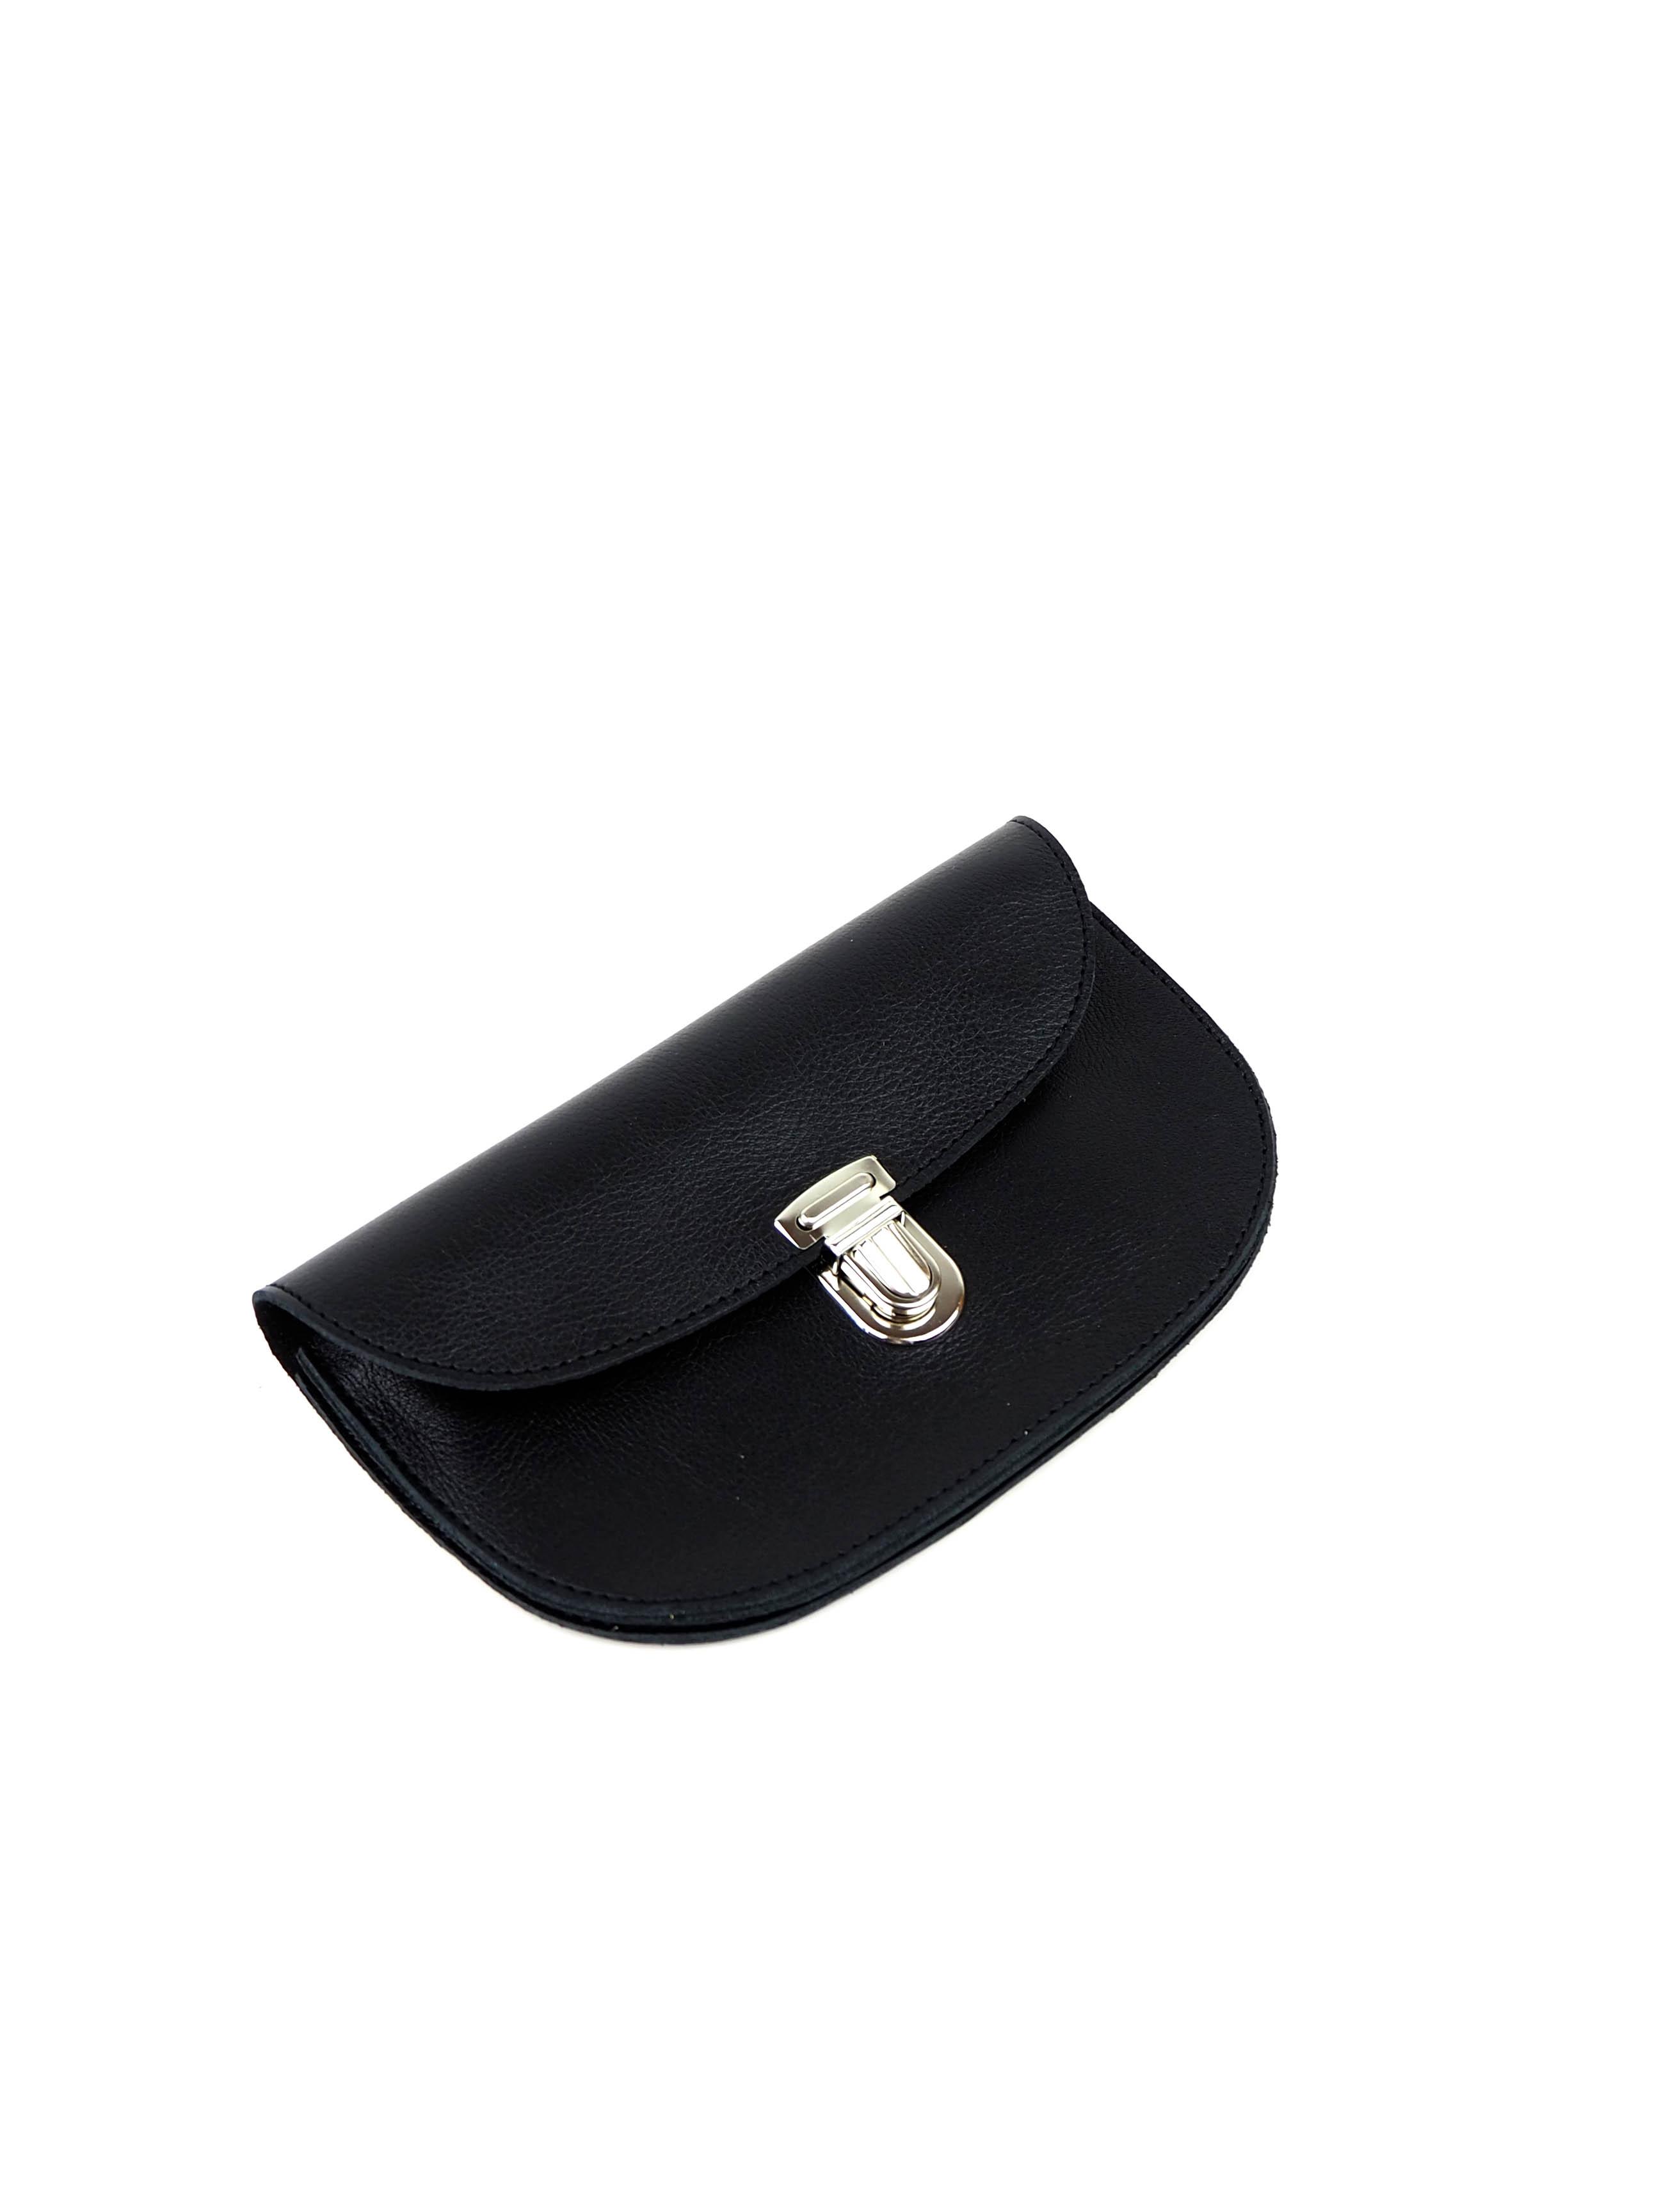 Musta lompakko - Cobblerina